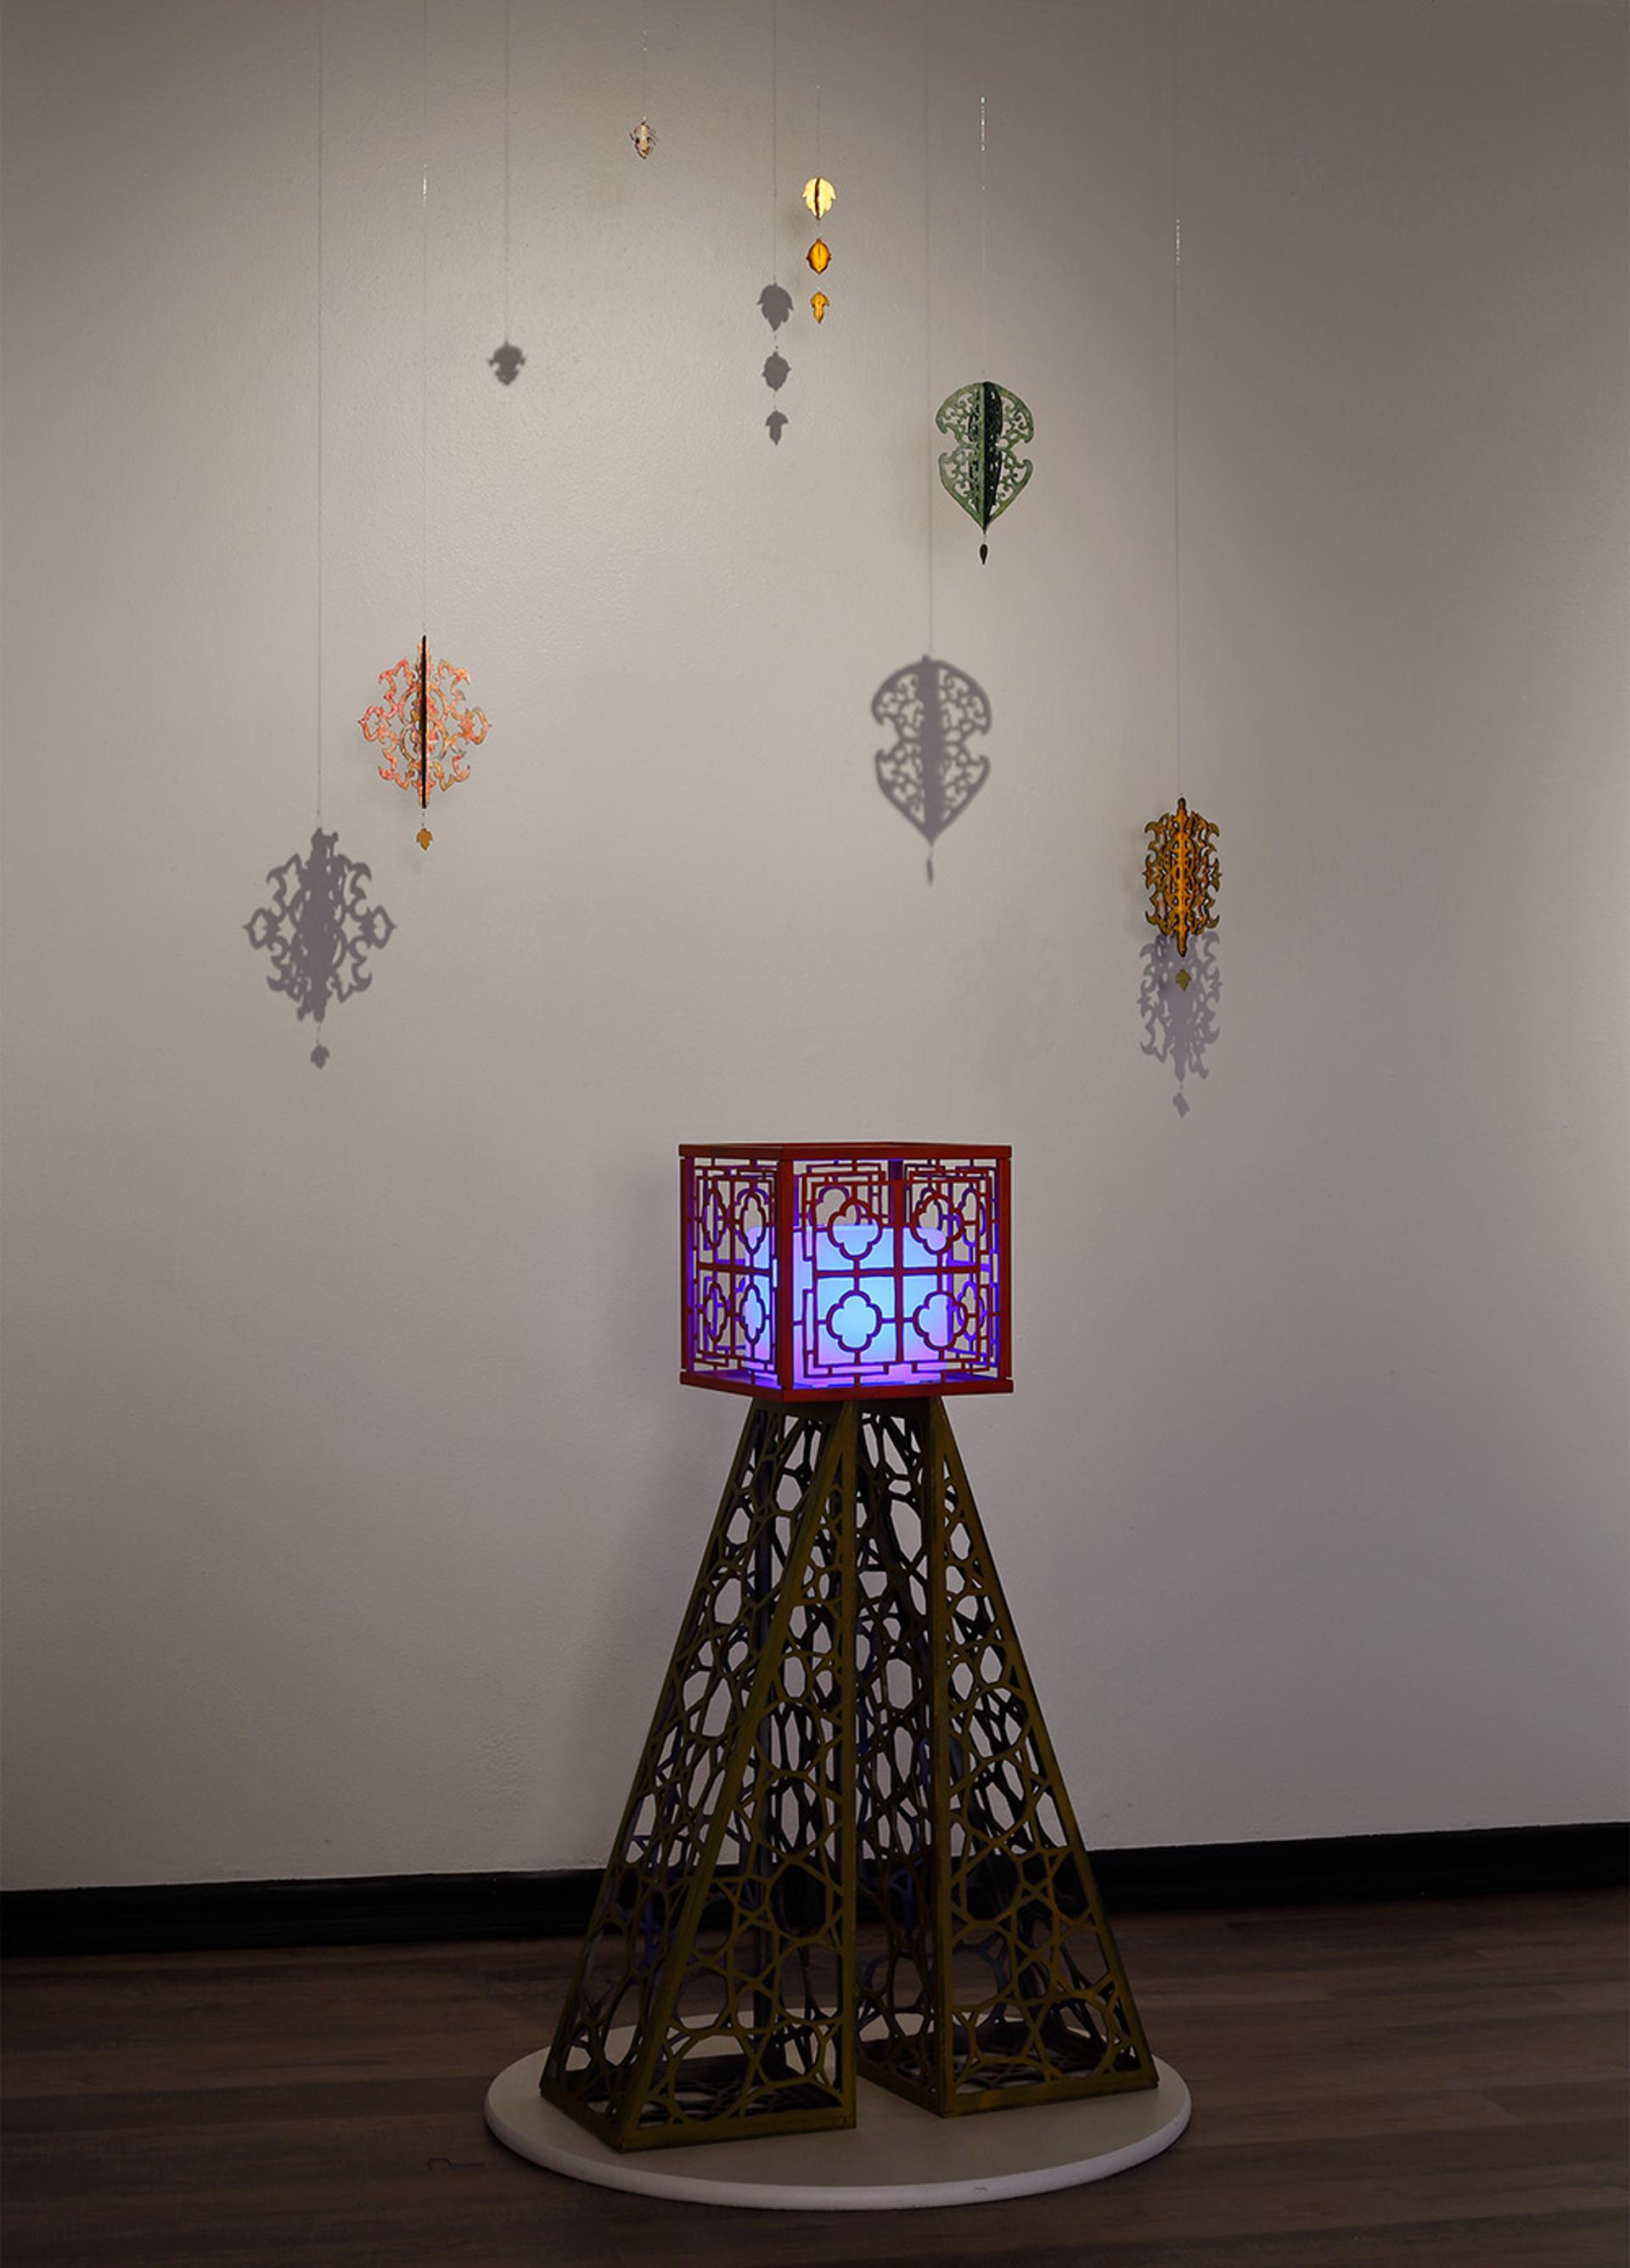 Lao Lattice  by June Sekiguchi